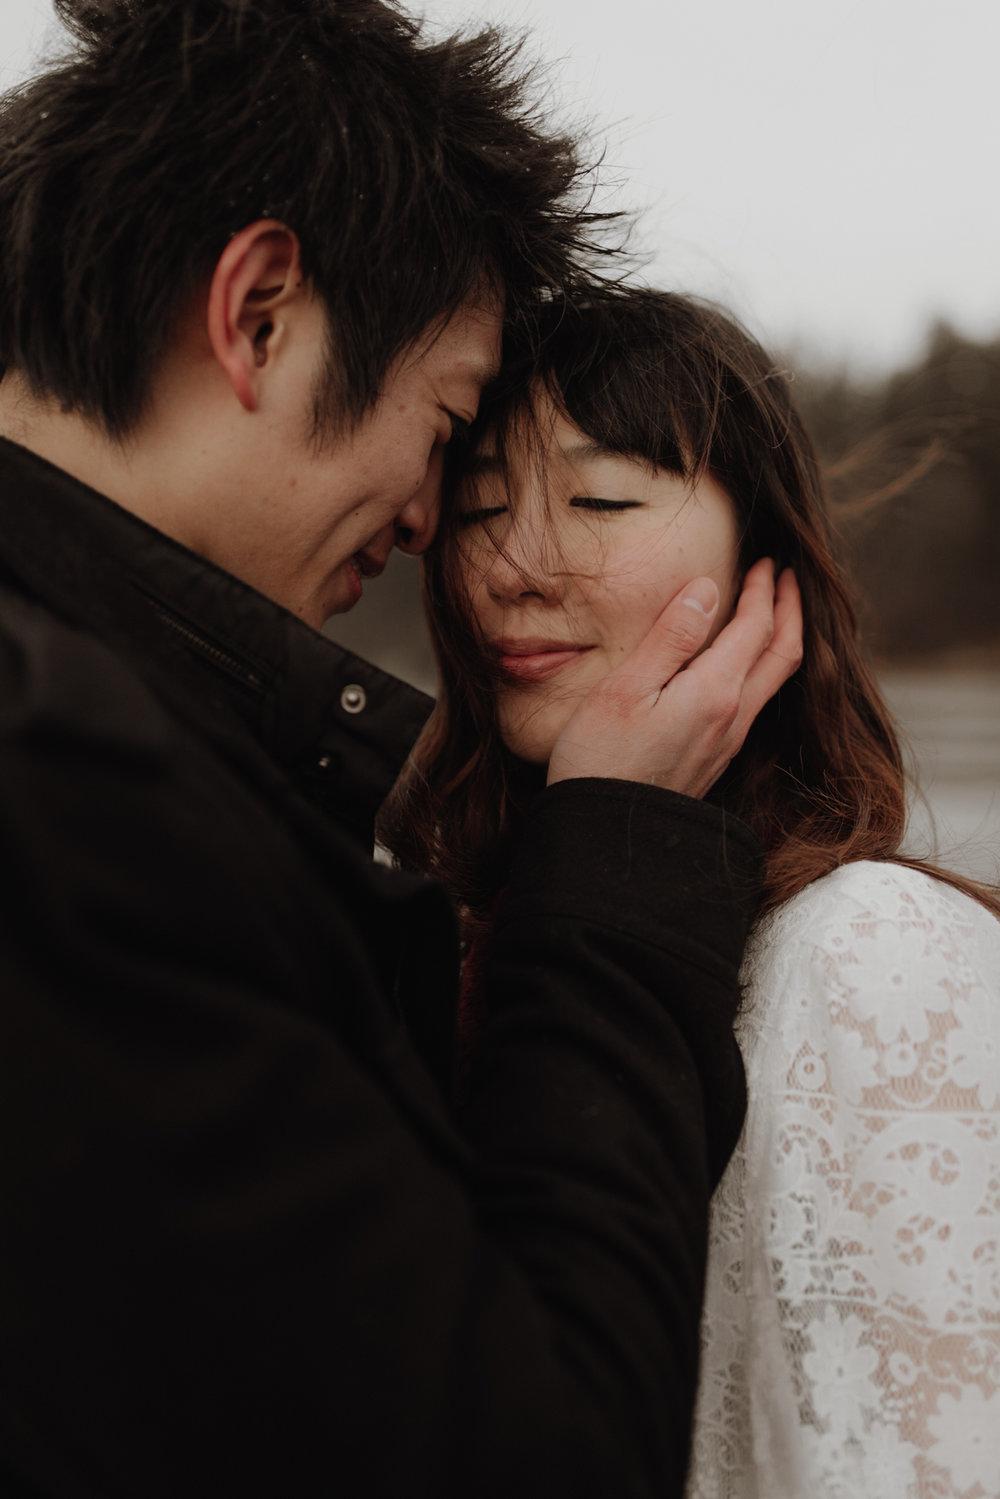 seattle-wedding-photographer-kerouac-0195.jpg